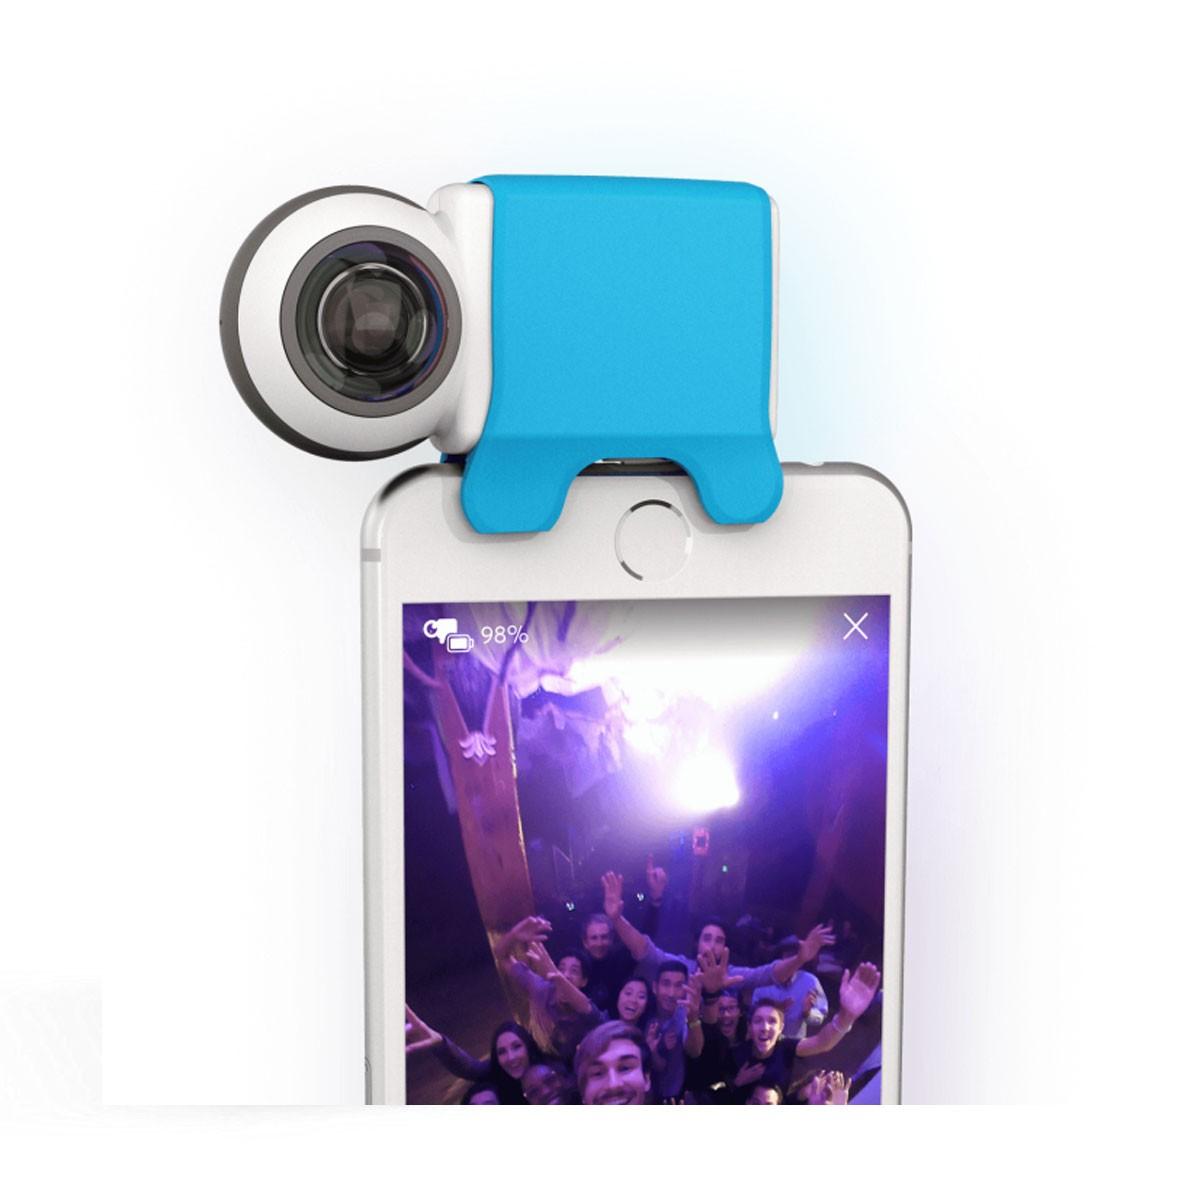 Giroptic - iO 360°-os kamera lightning csatlakozóval